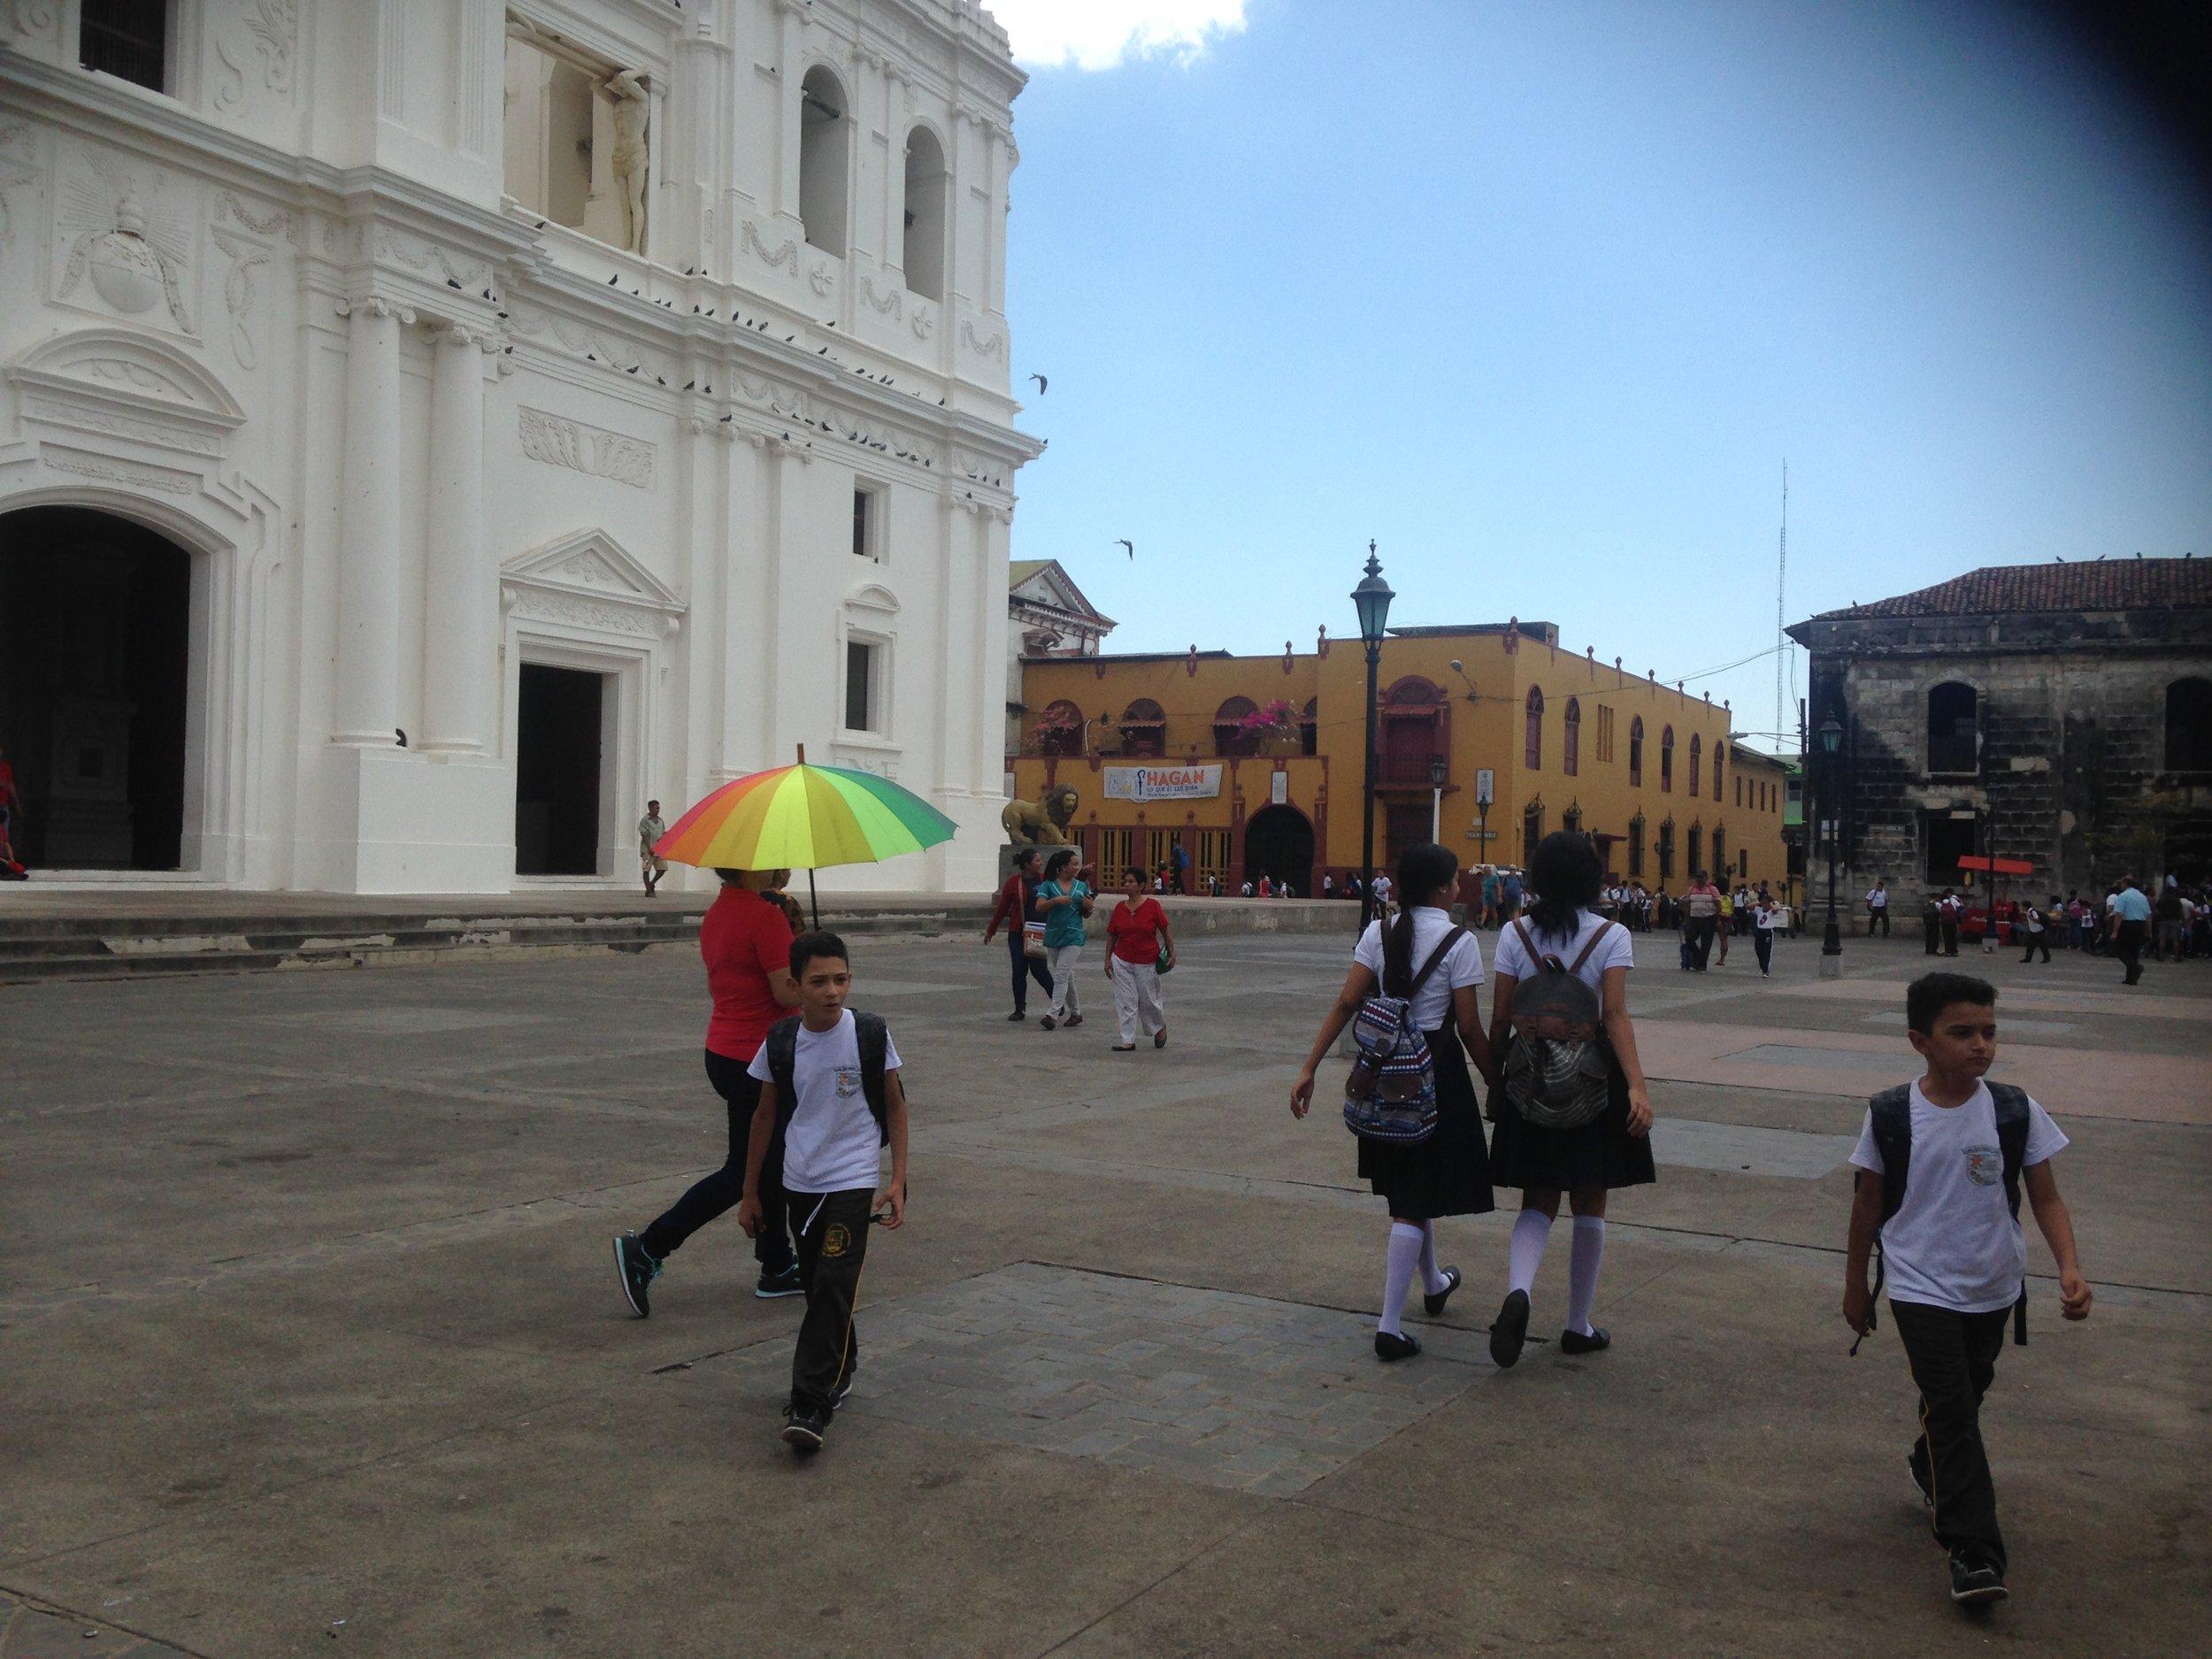 Mid-day scene in Leon, Nicaragua.